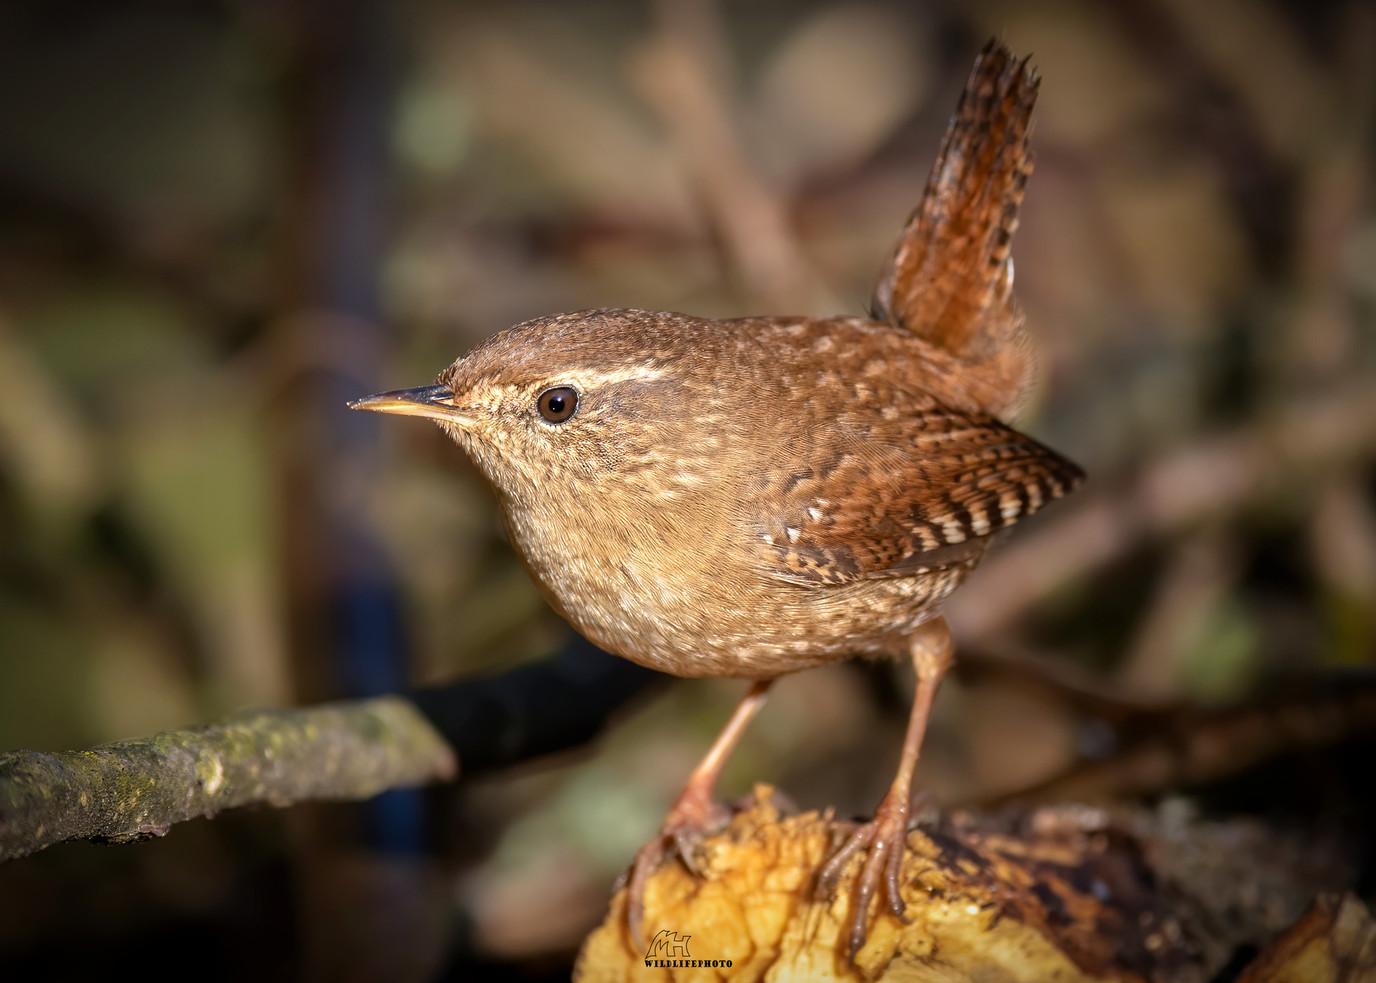 Europas drittkleinster Vogel - Vogel Fotografie